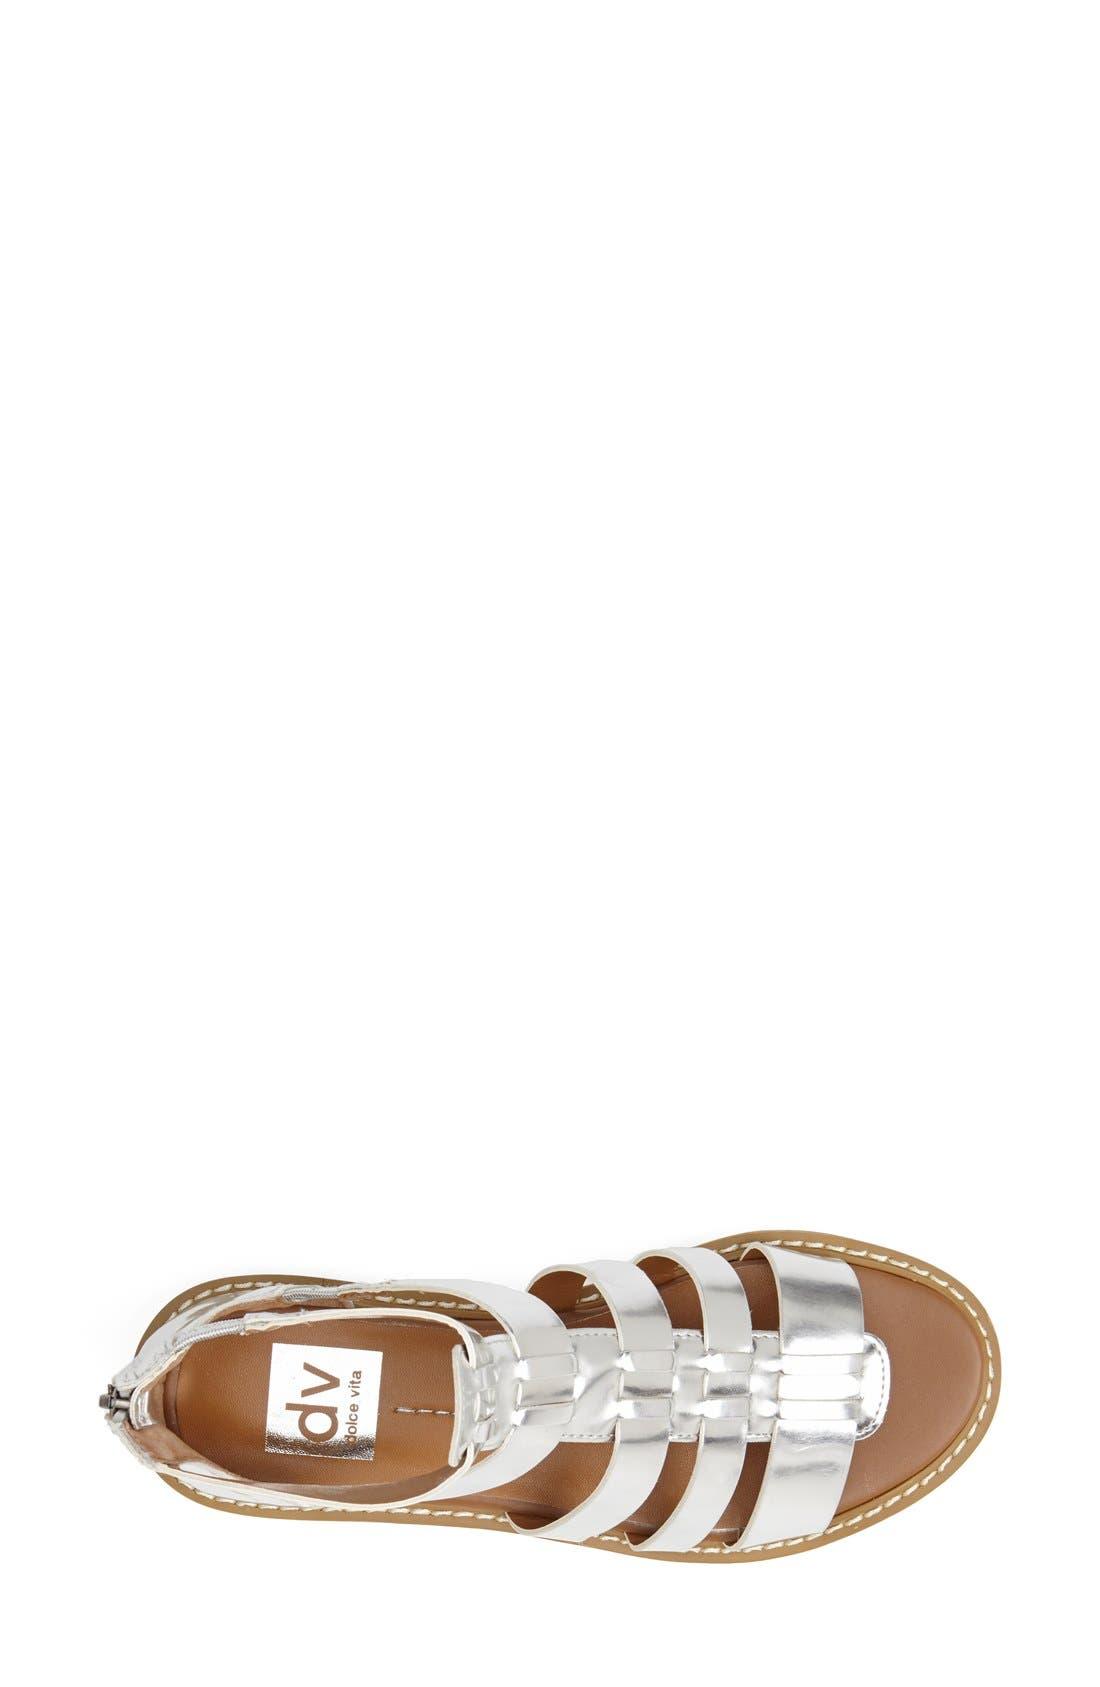 Alternate Image 3  - DV by Dolce Vita 'Zippy' Platform Sandal (Women)